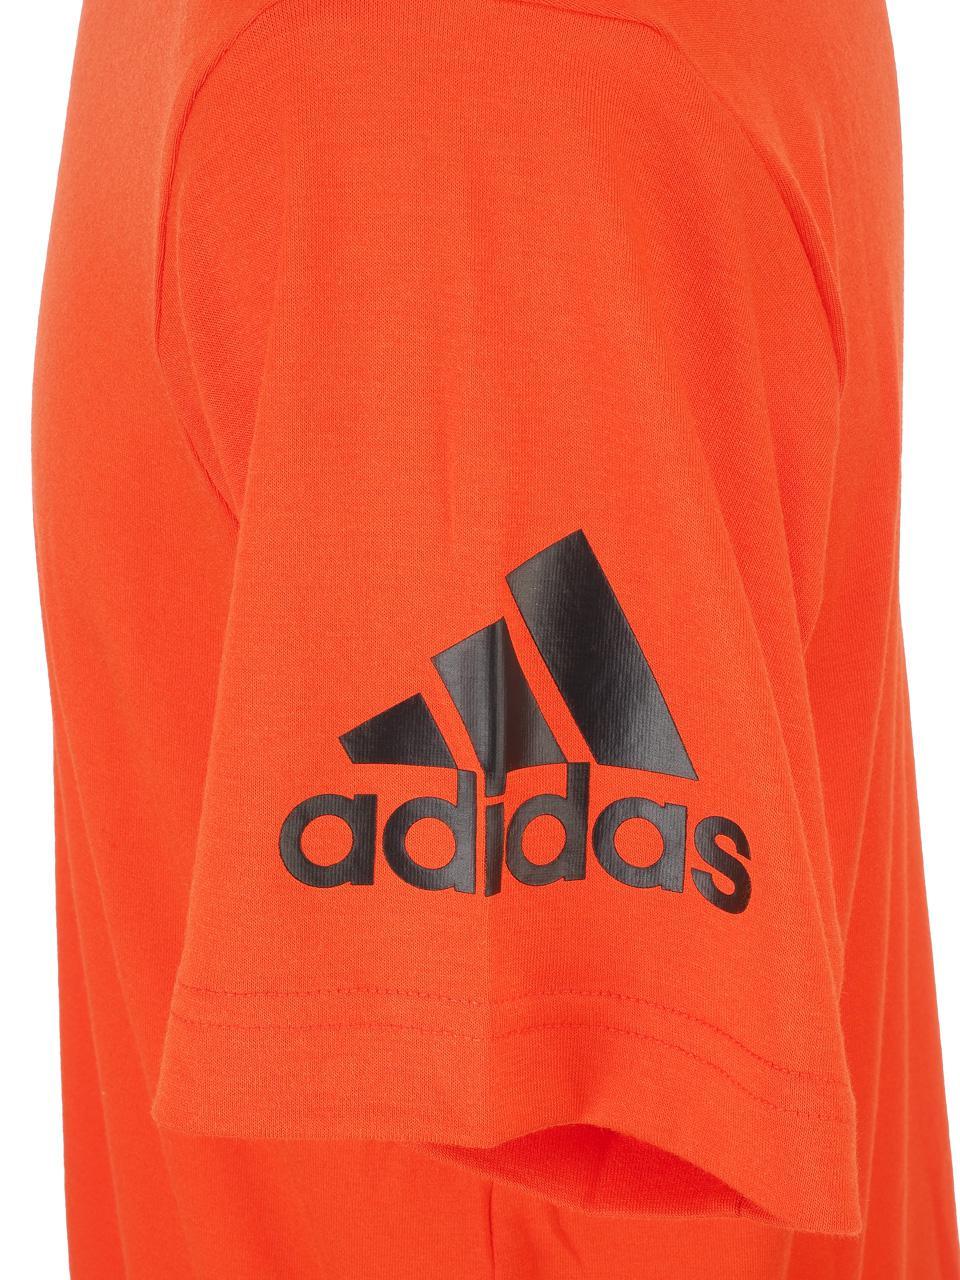 Short-Sleeve-T-Shirt-Adidas-Freelift-Premium-Rge-Mc-Tee-Red-50082-New thumbnail 2